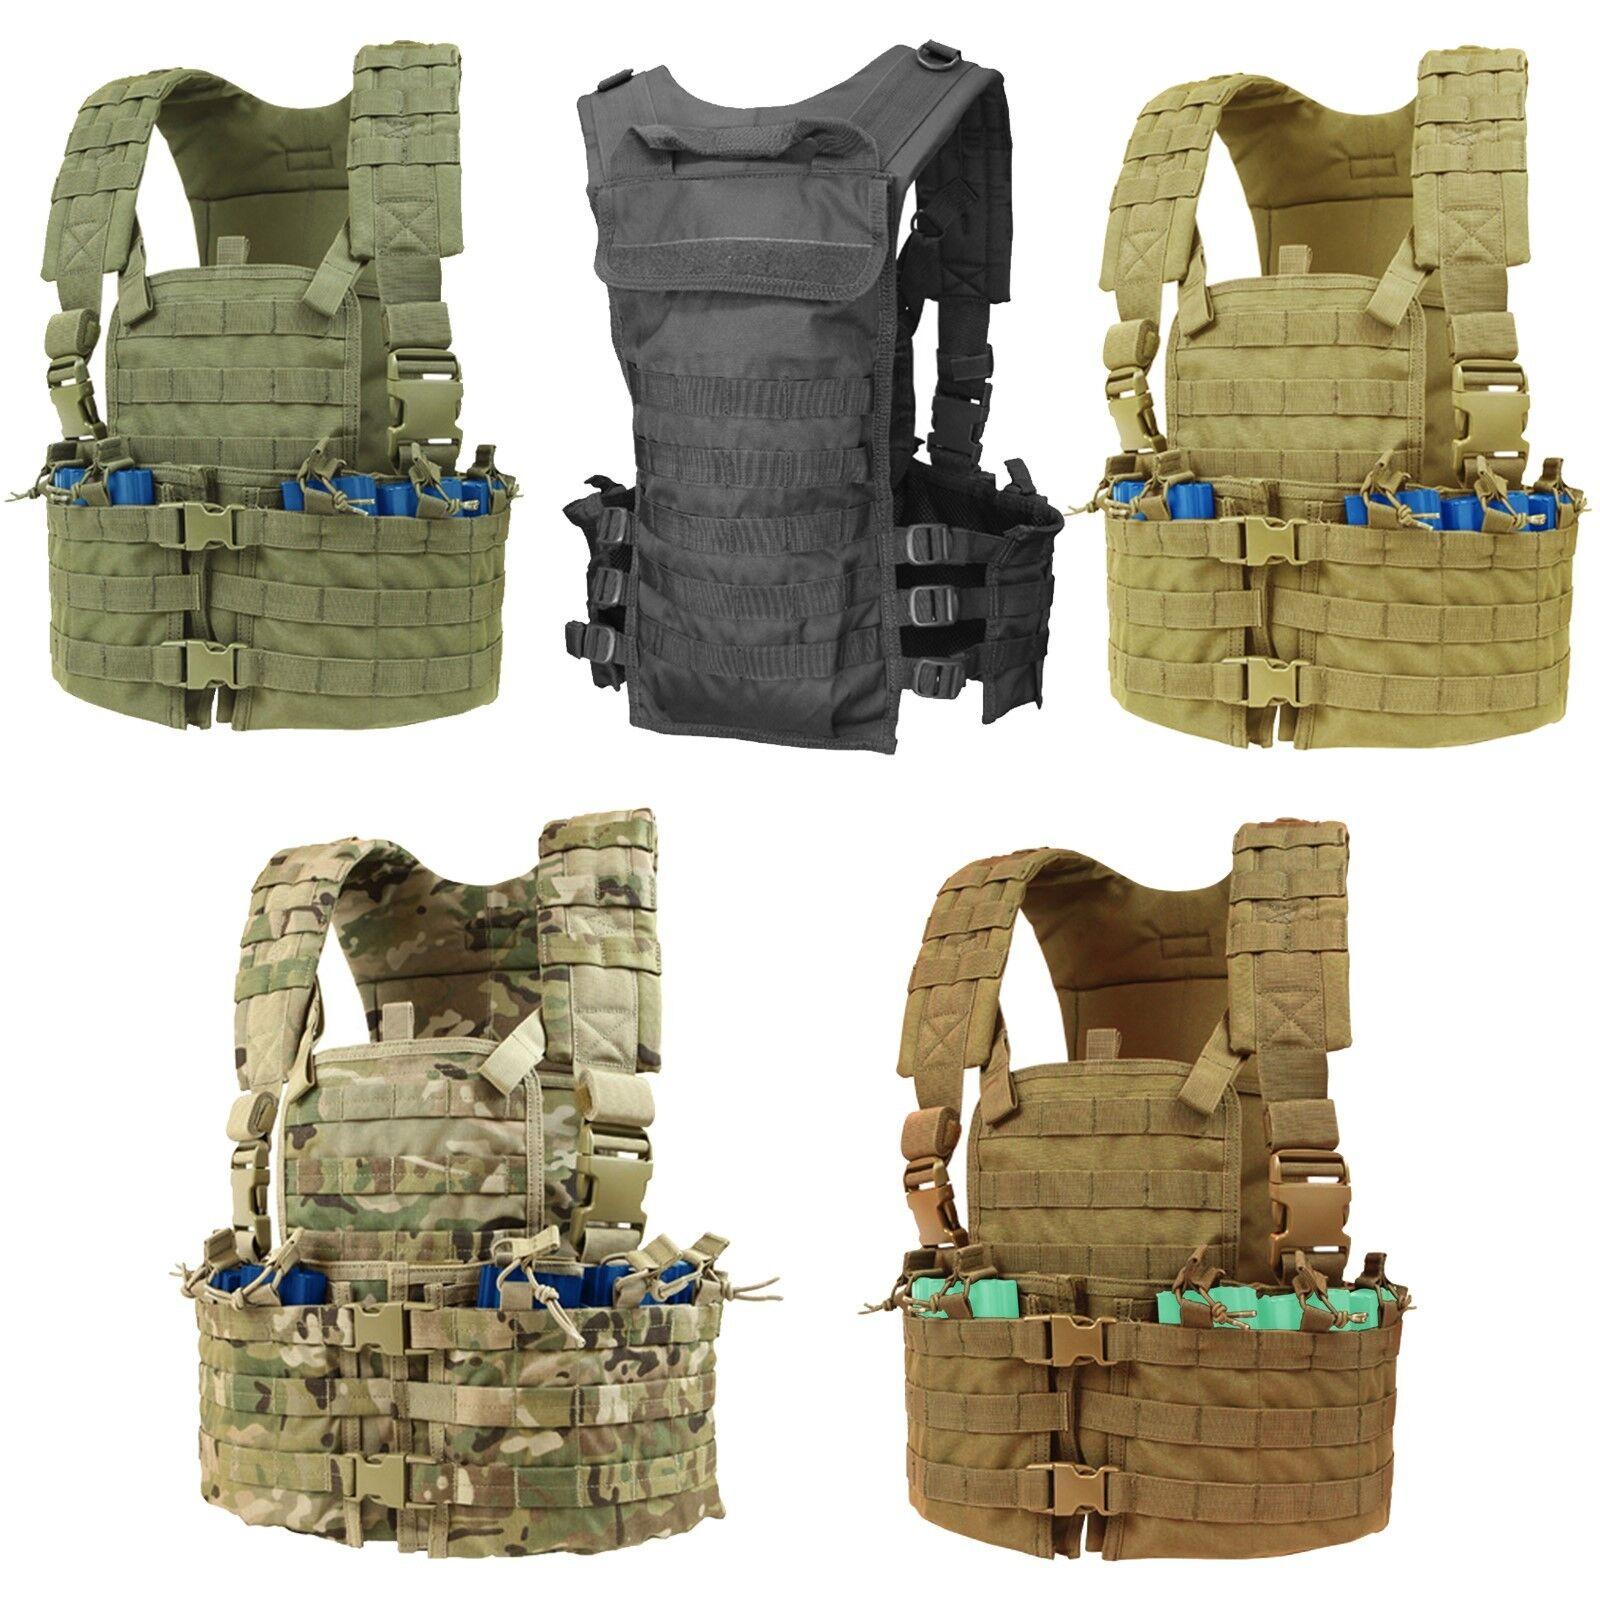 e71d58f741 Condor MOLLE PALS Modular 5.56/.223 Tactical Hydration Pouch Modular Chest  Rig